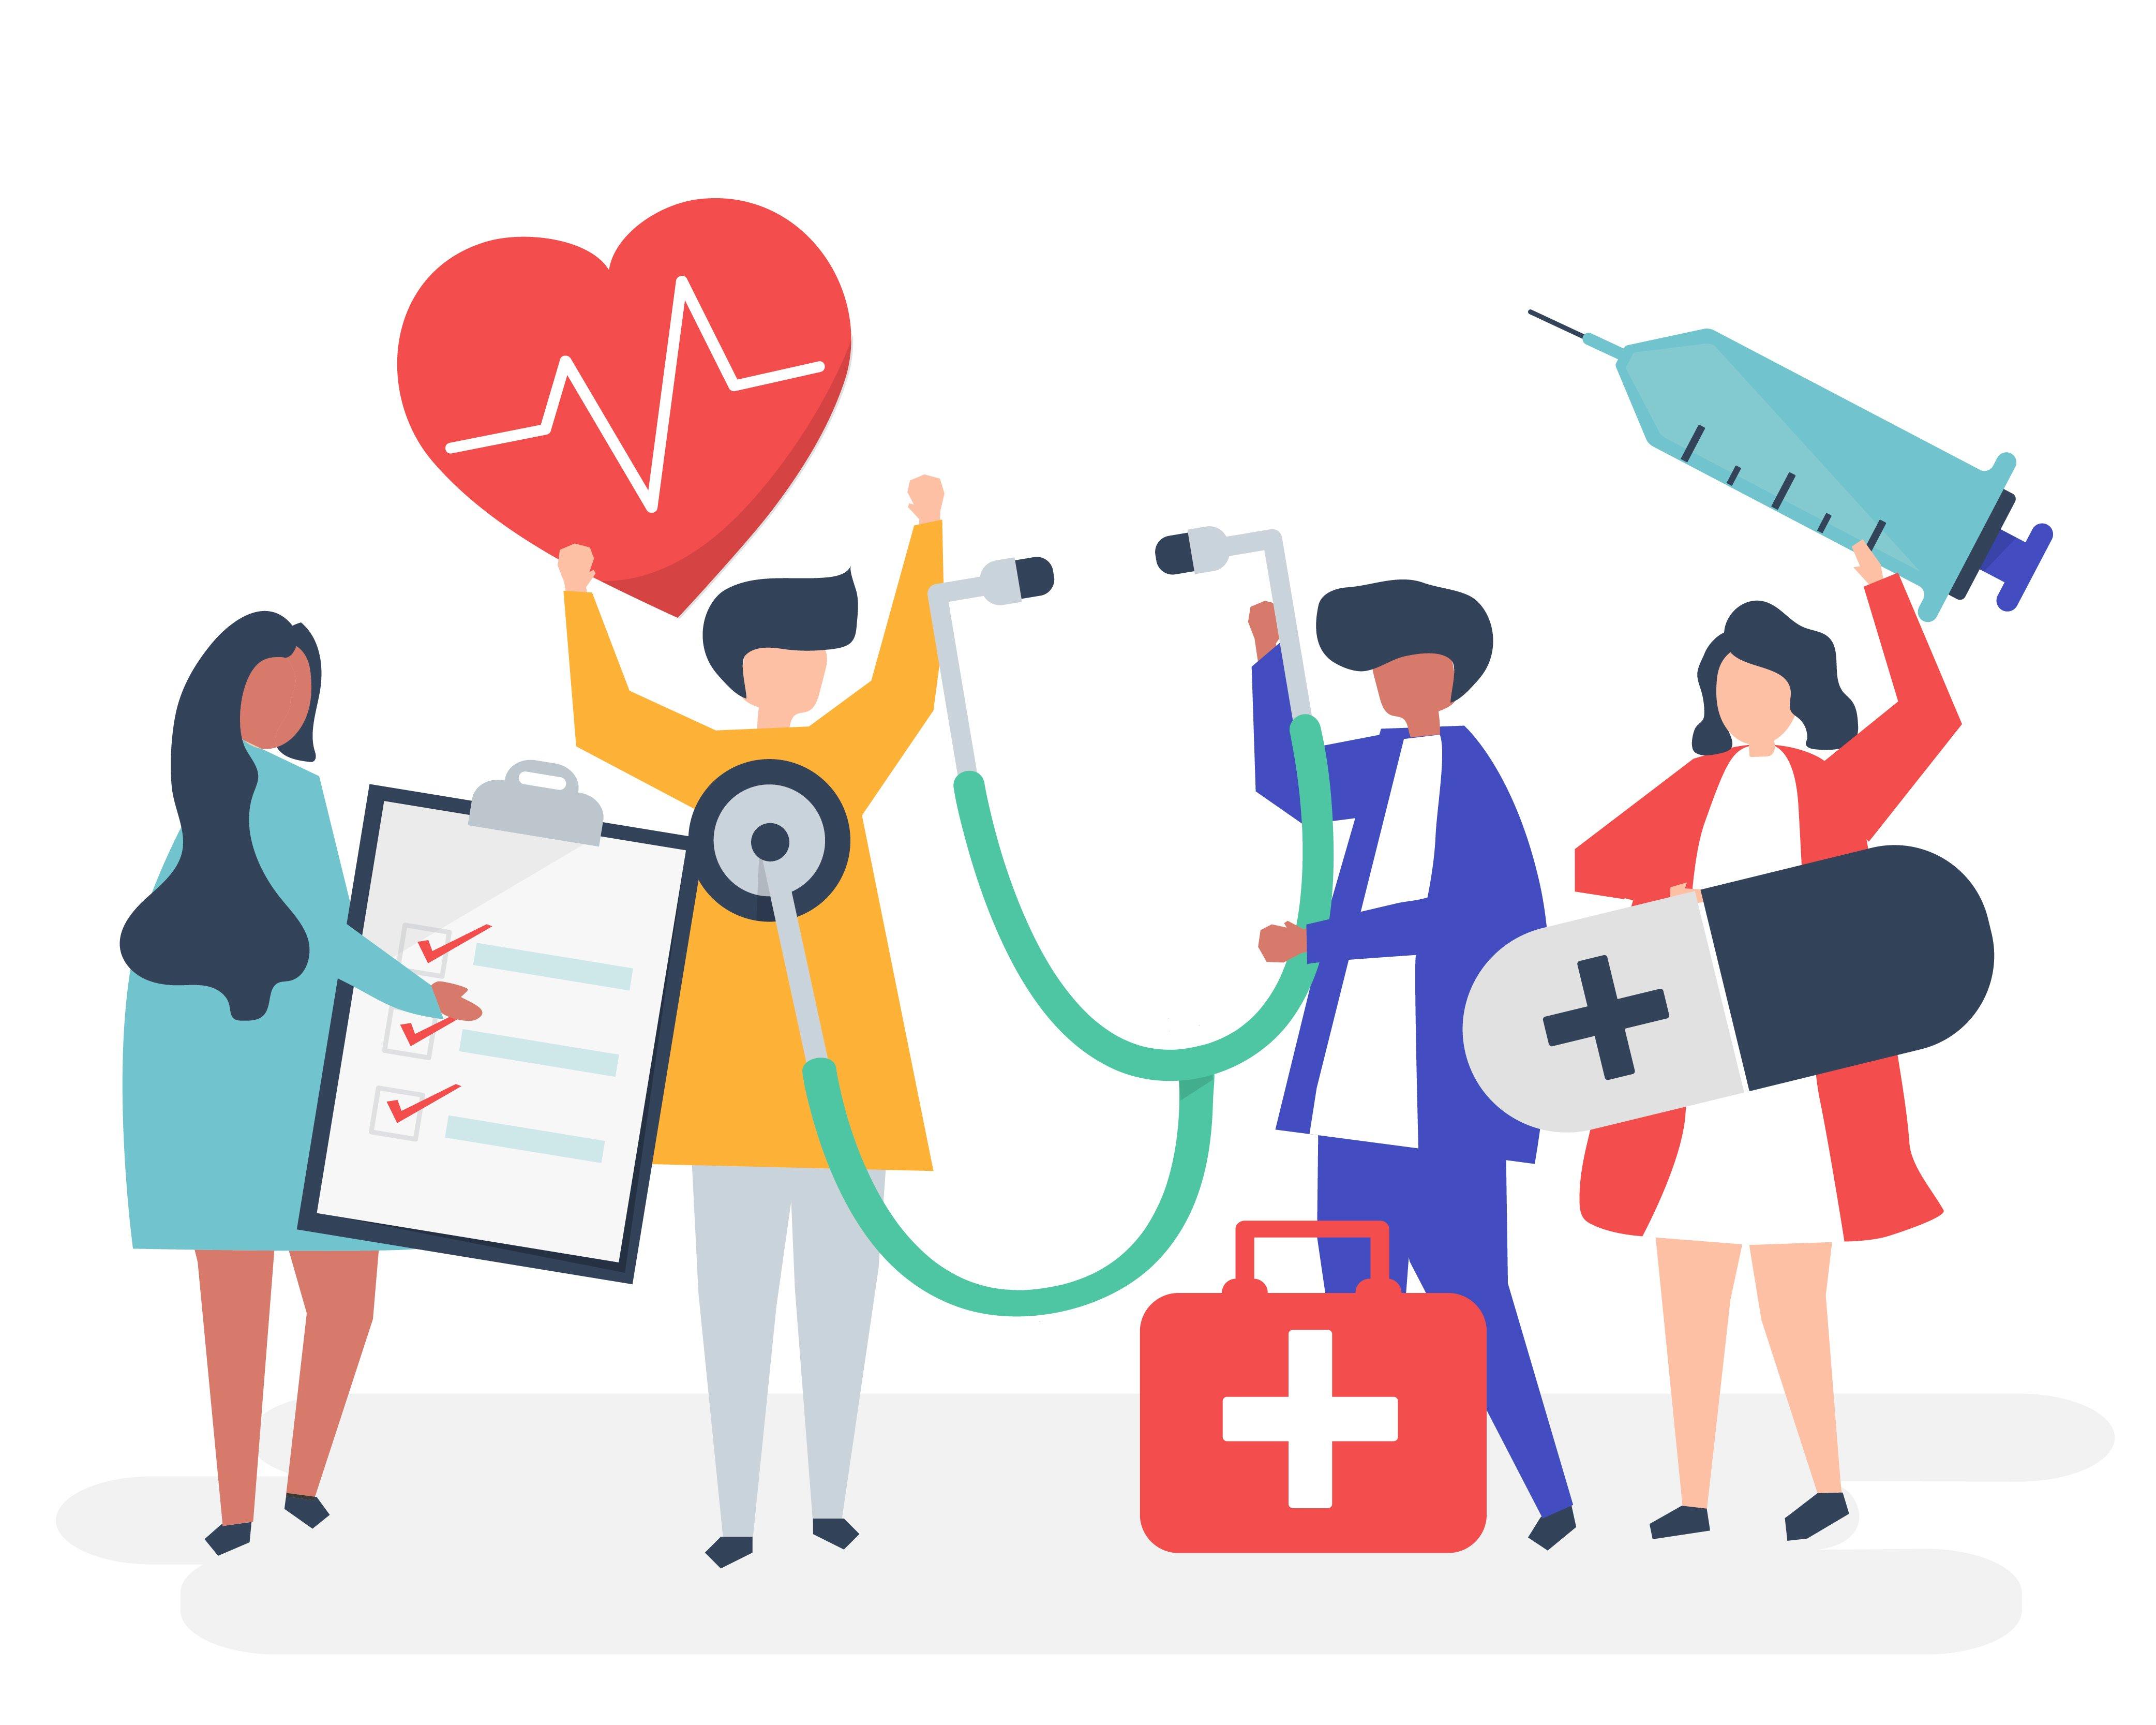 asx-pnv-healthcare-shares-doctor-medical